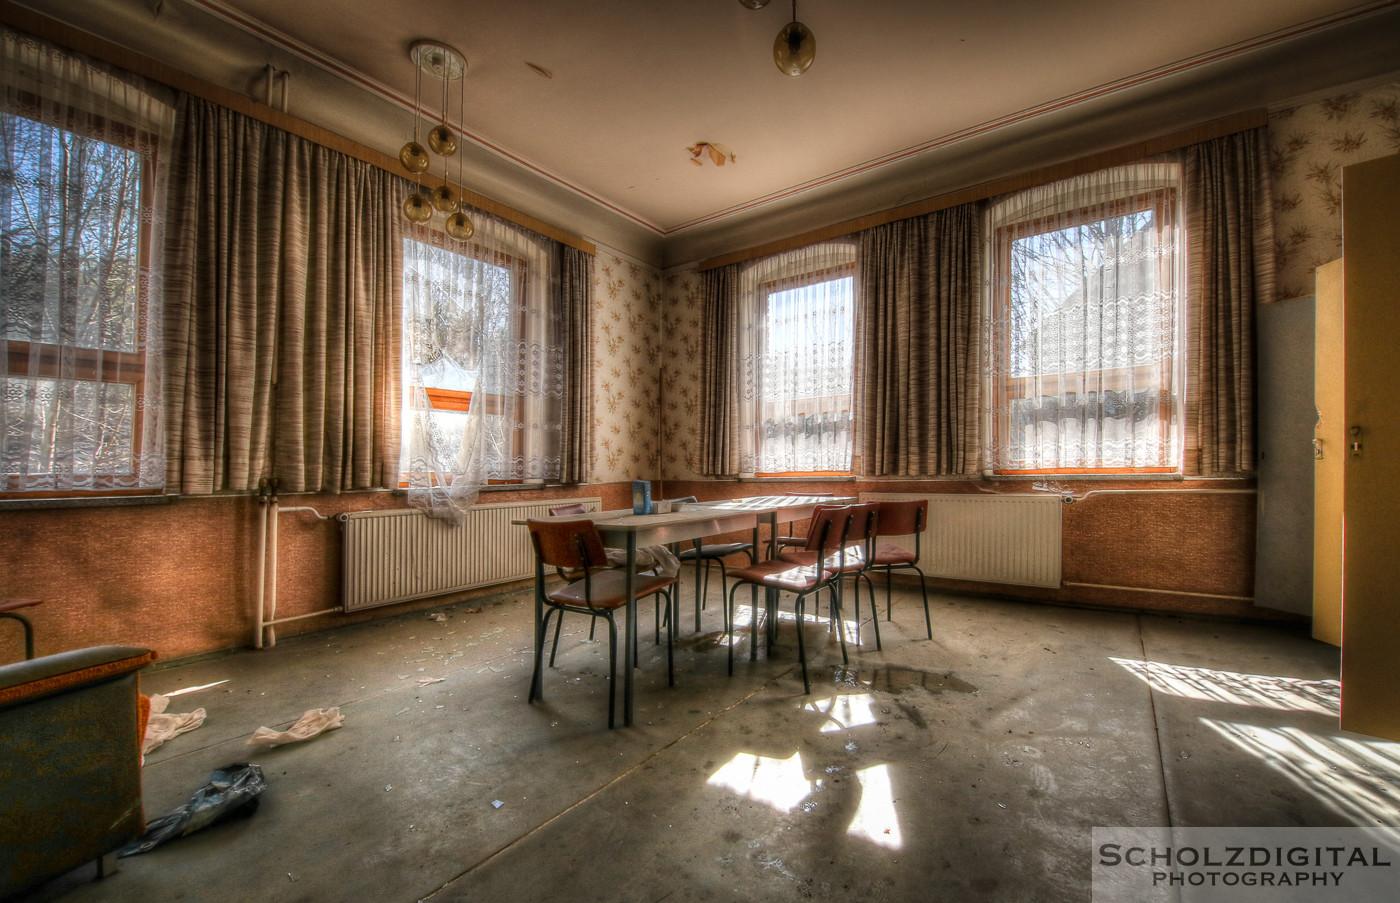 Abandoned, Decay, Lost Place, Urban exploration, Urbex, verlassen, Verlassene Orte, urbexlocatie, beelden, urban exploration, lost place, abandoned, forgotten, VEB Zwirn